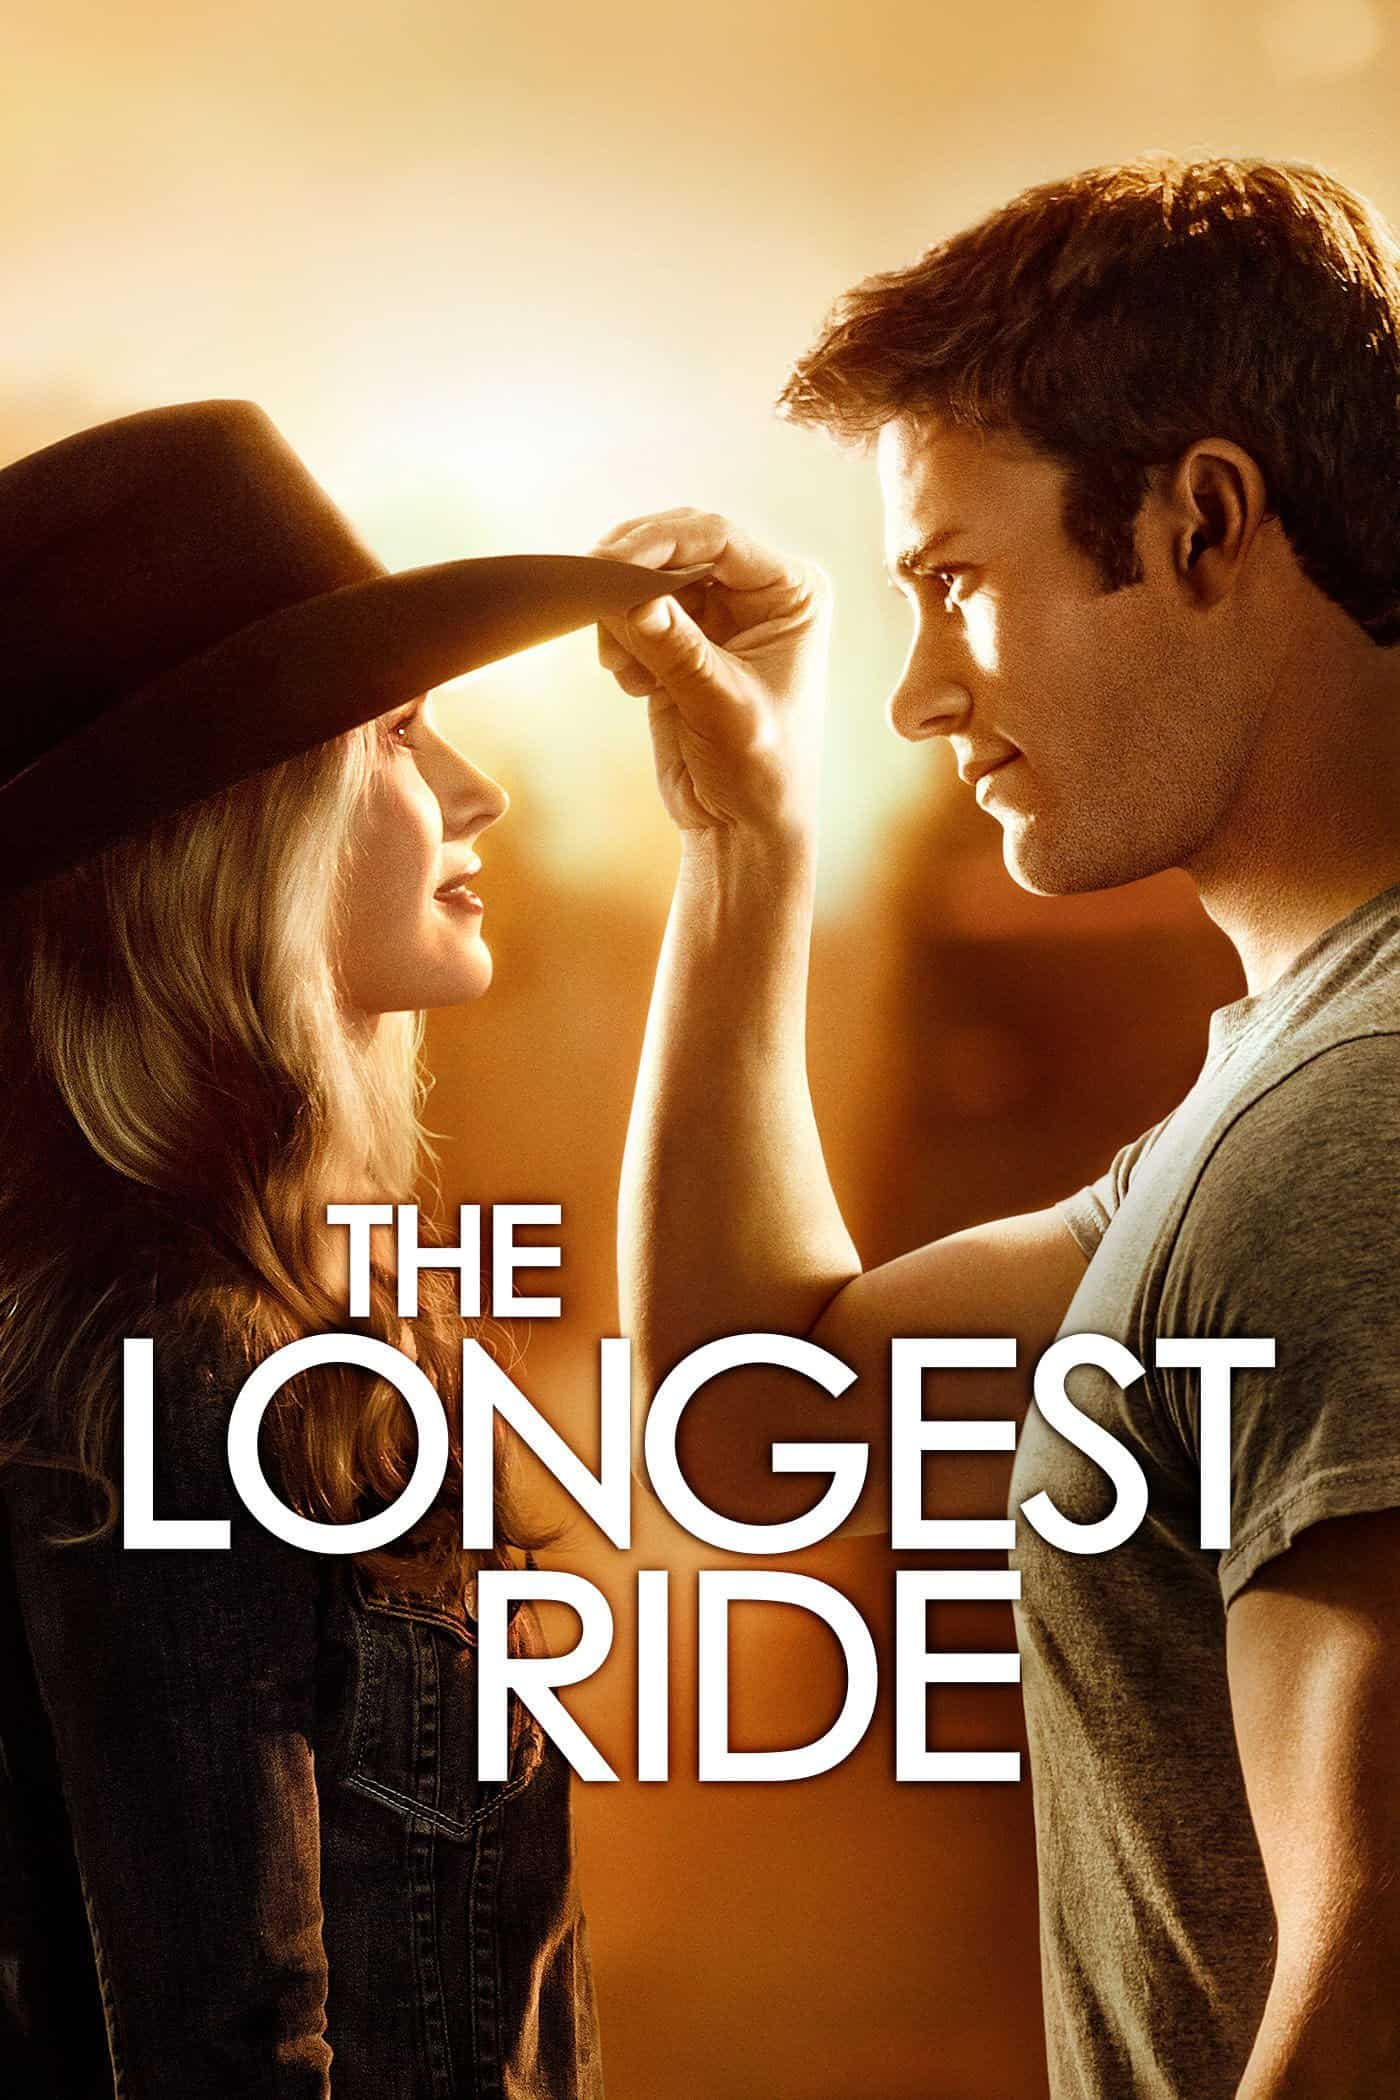 The Longest Ride, 2015